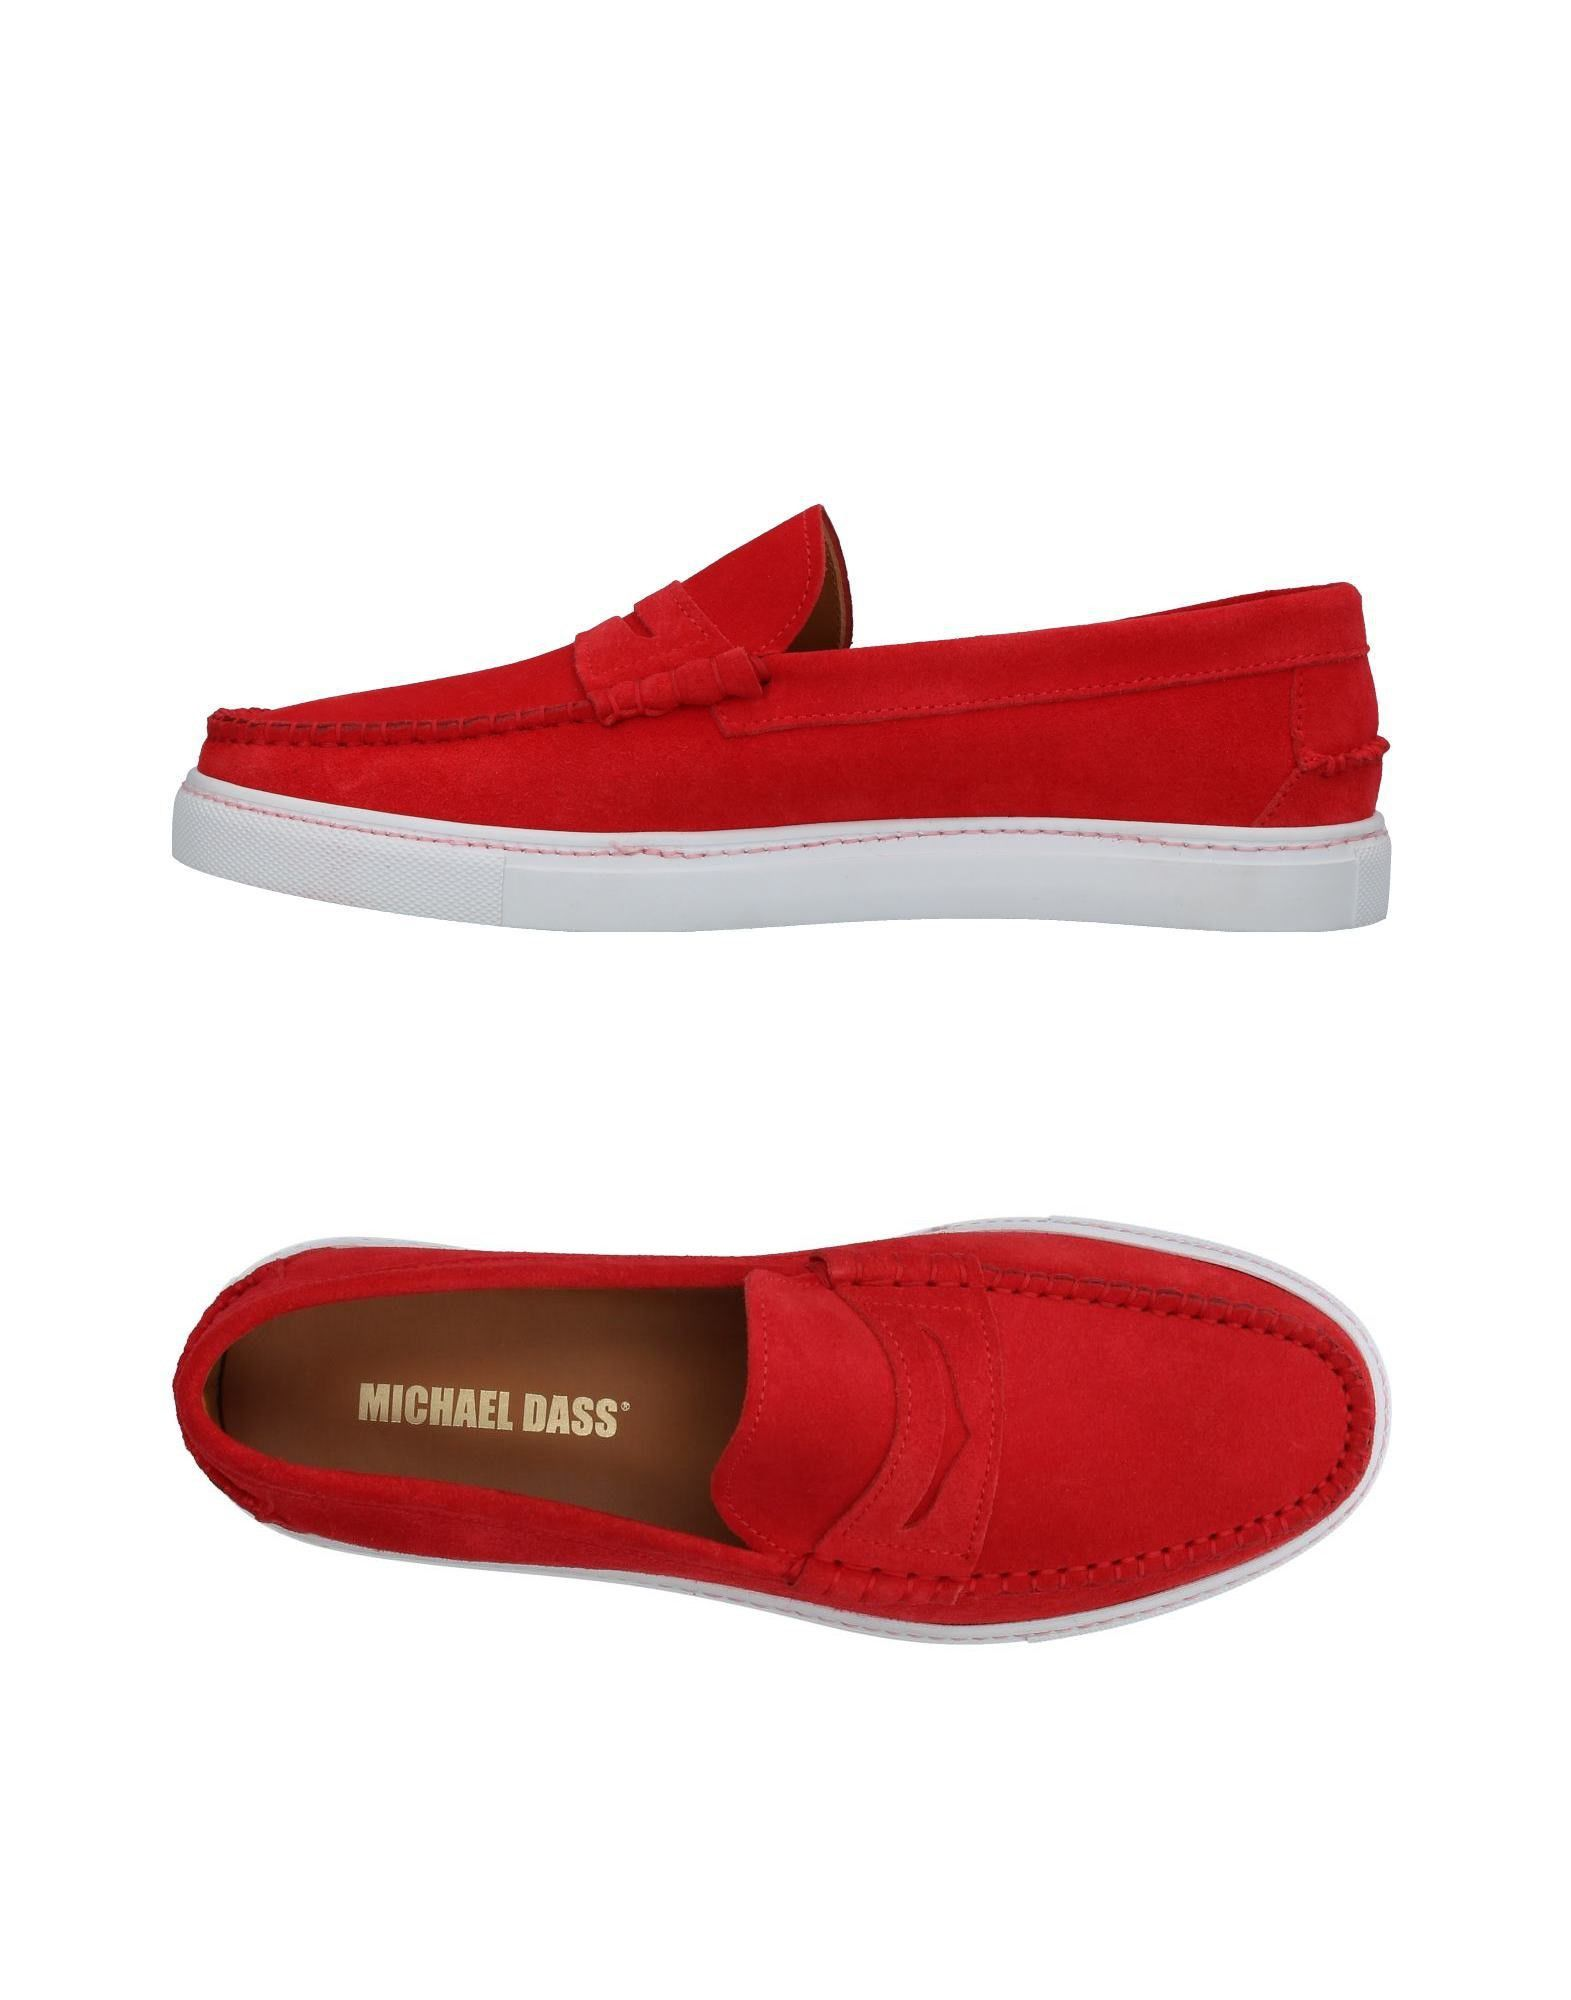 Michael Dass Mokassins Herren  11399736EE Neue Schuhe